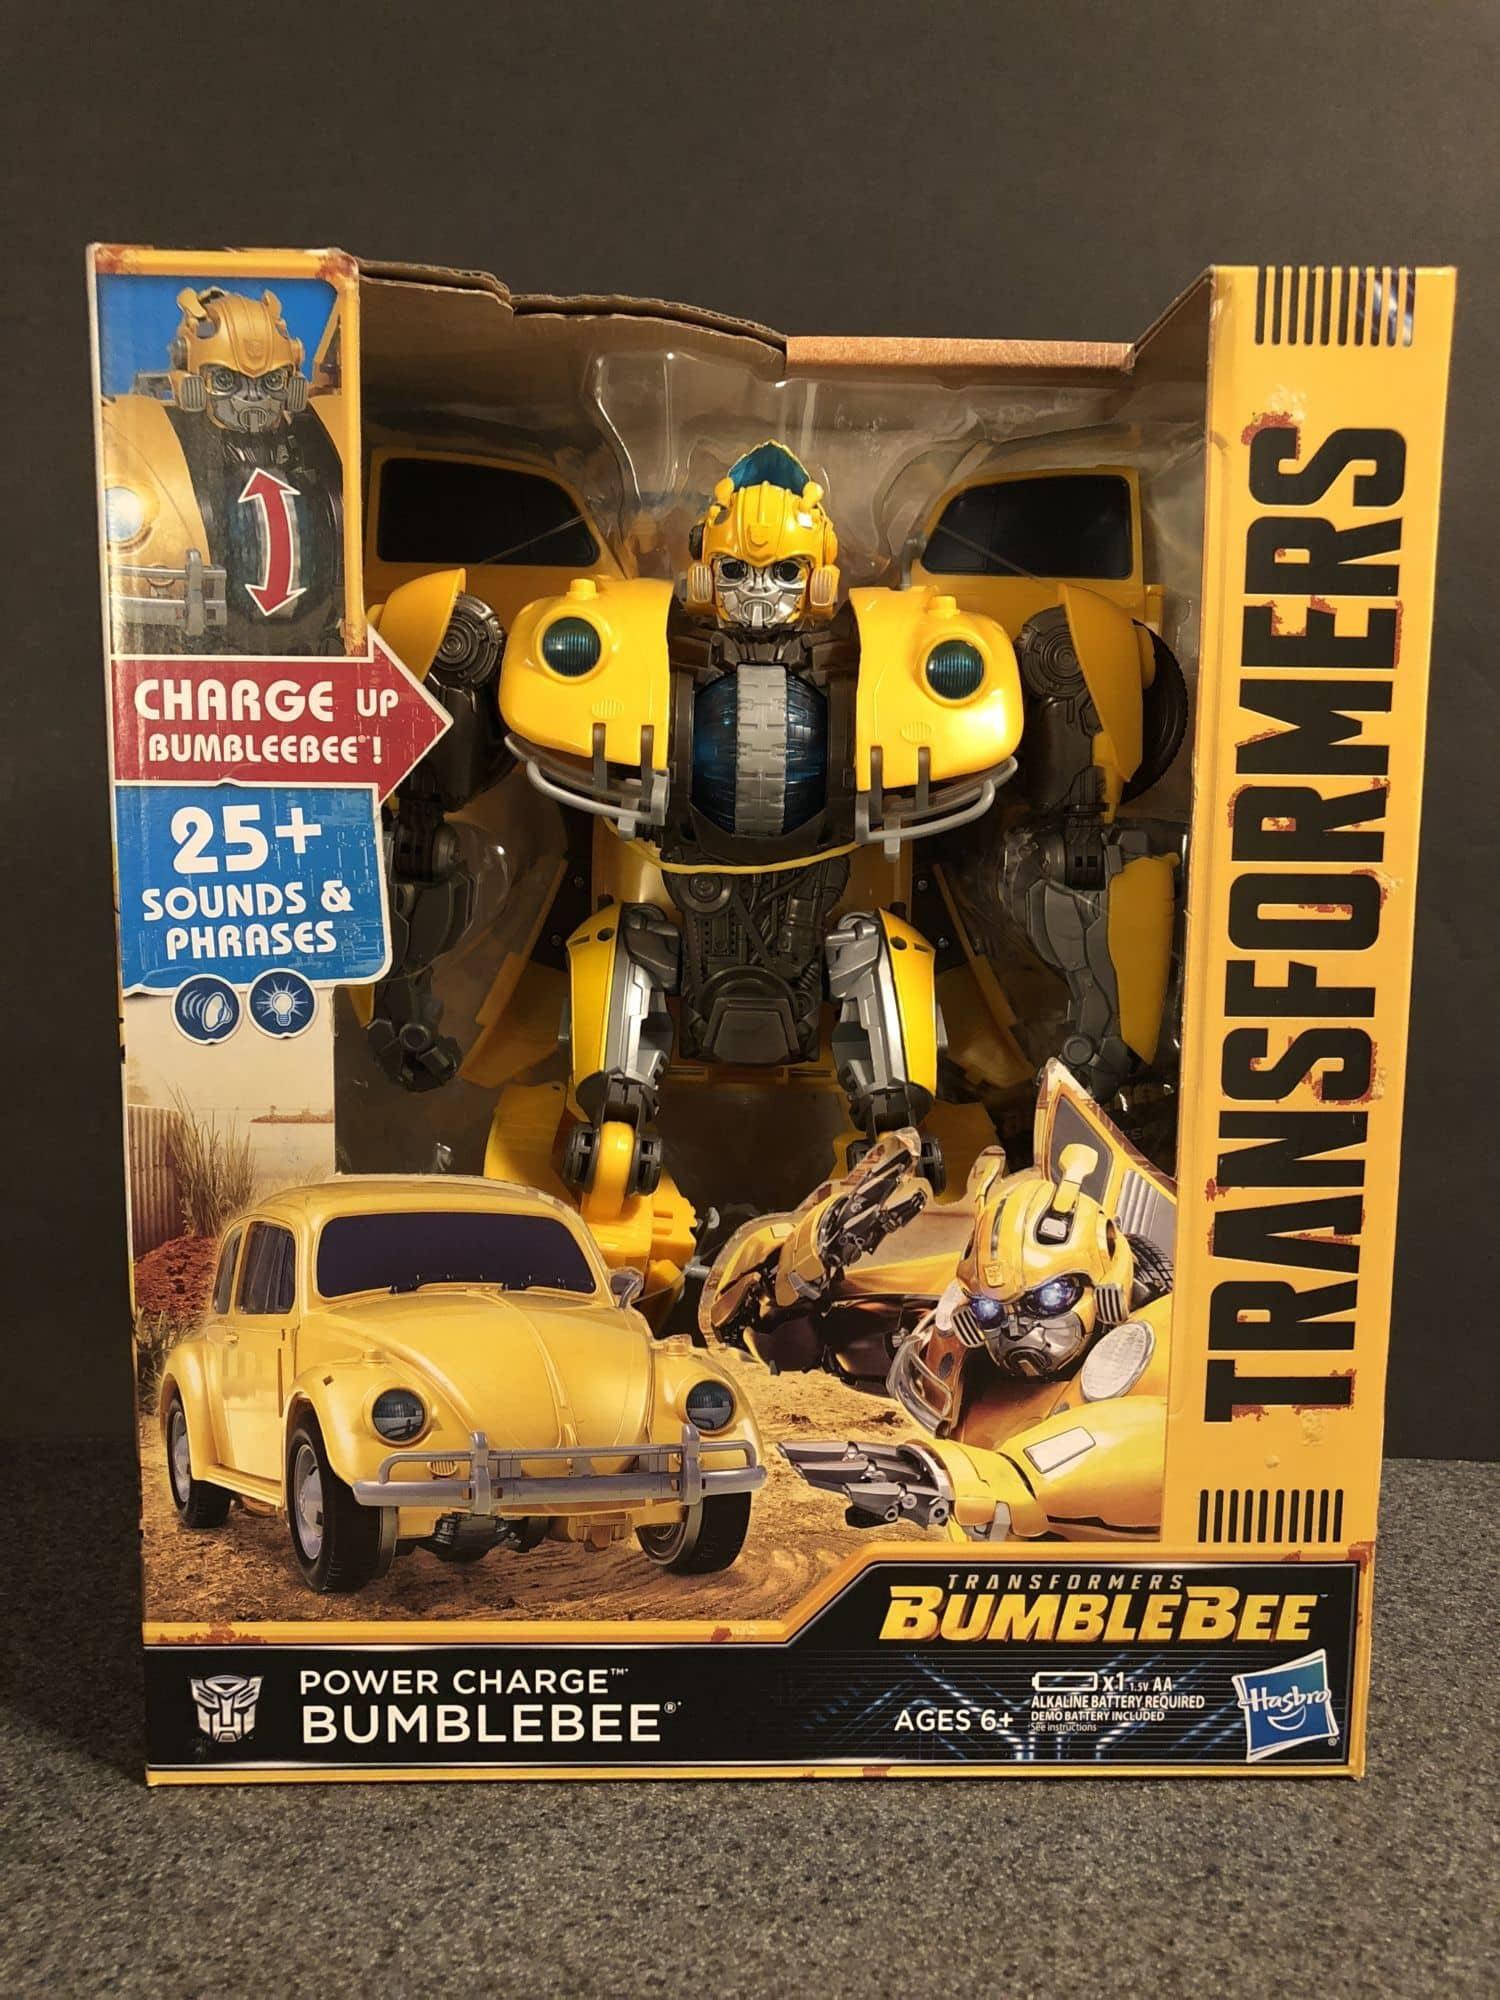 Hasbro Bumblebee Toys 2